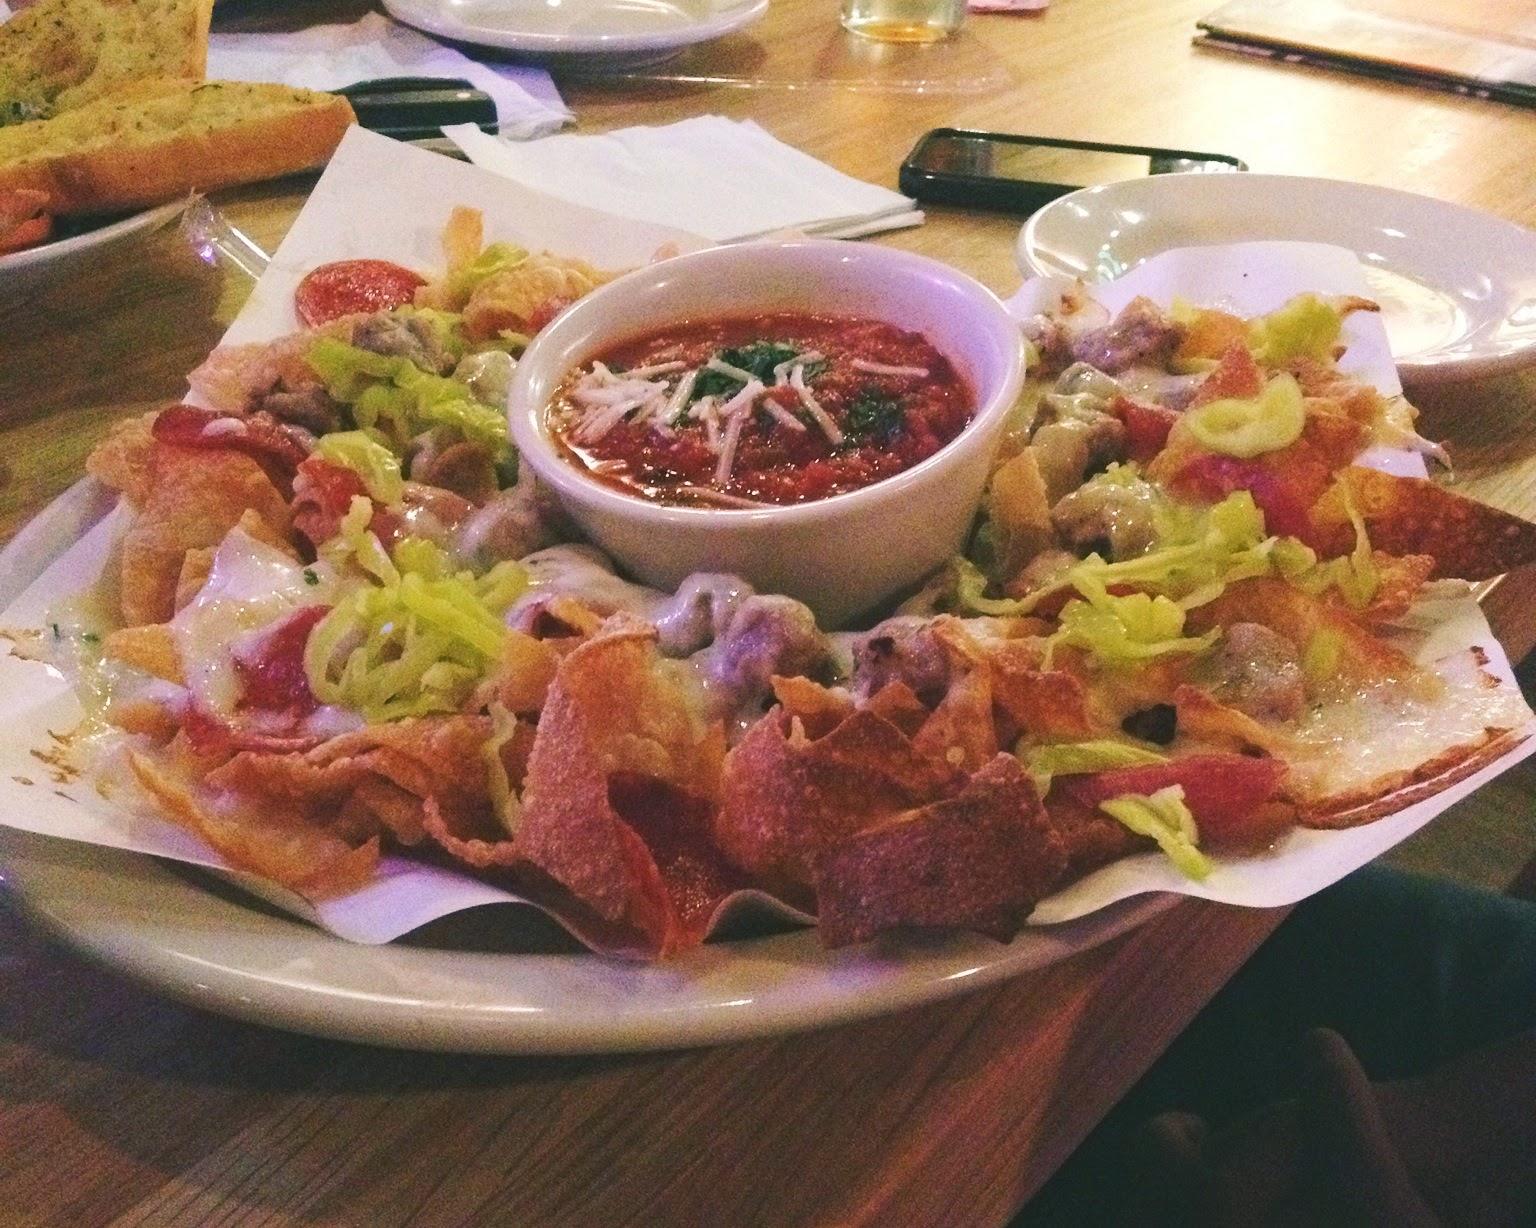 Chapel Hill restaurants, Italian Nachos, Old Chicago, appetizers